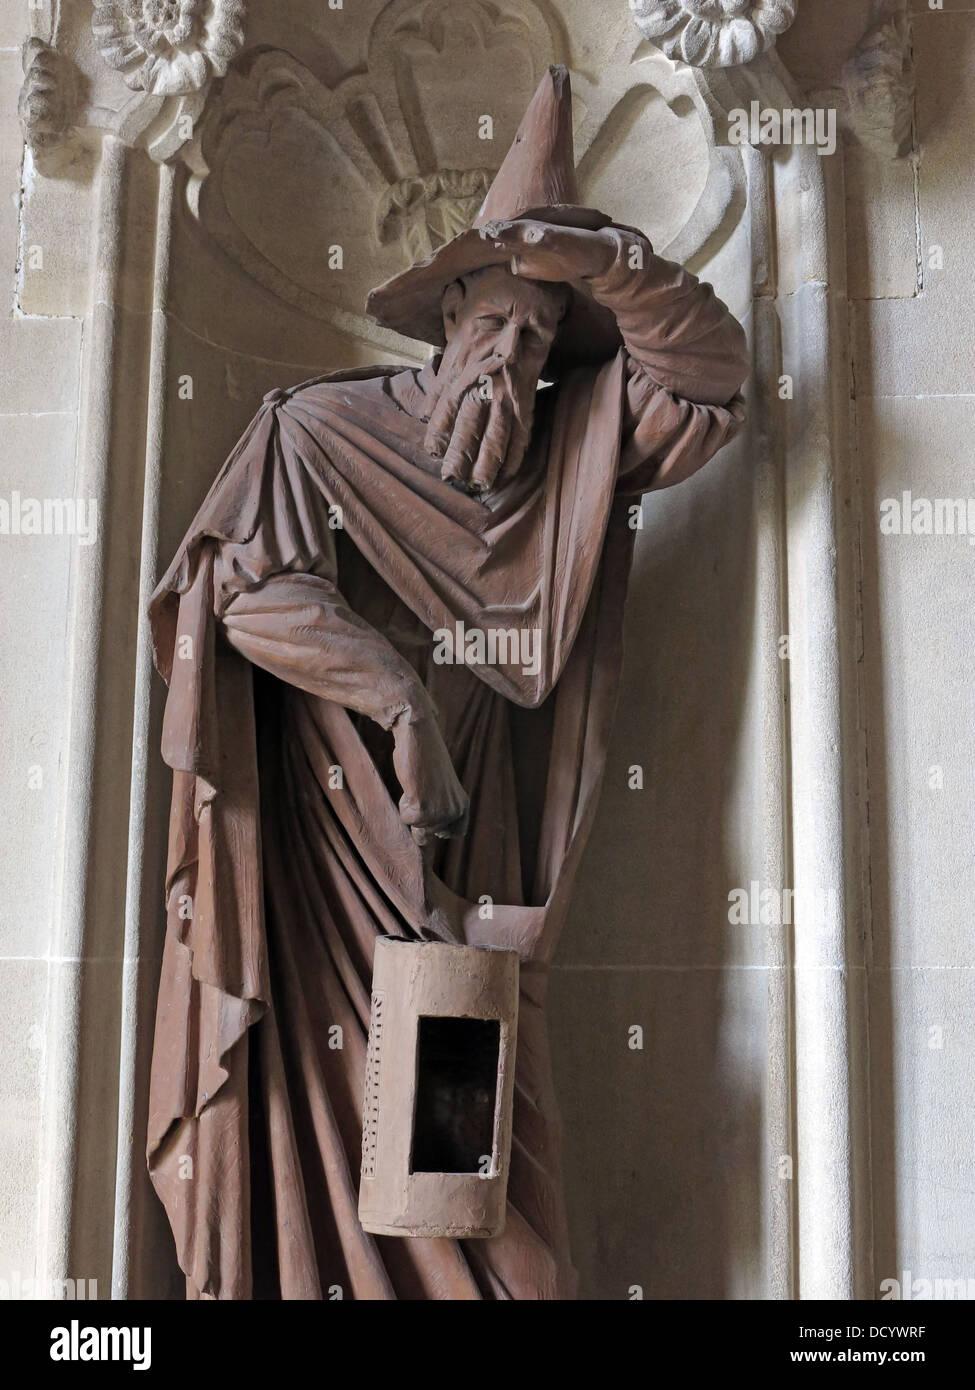 An iron statue of a wizard at Waddesdon Manor NT, Bucks, England, UK - Stock Image